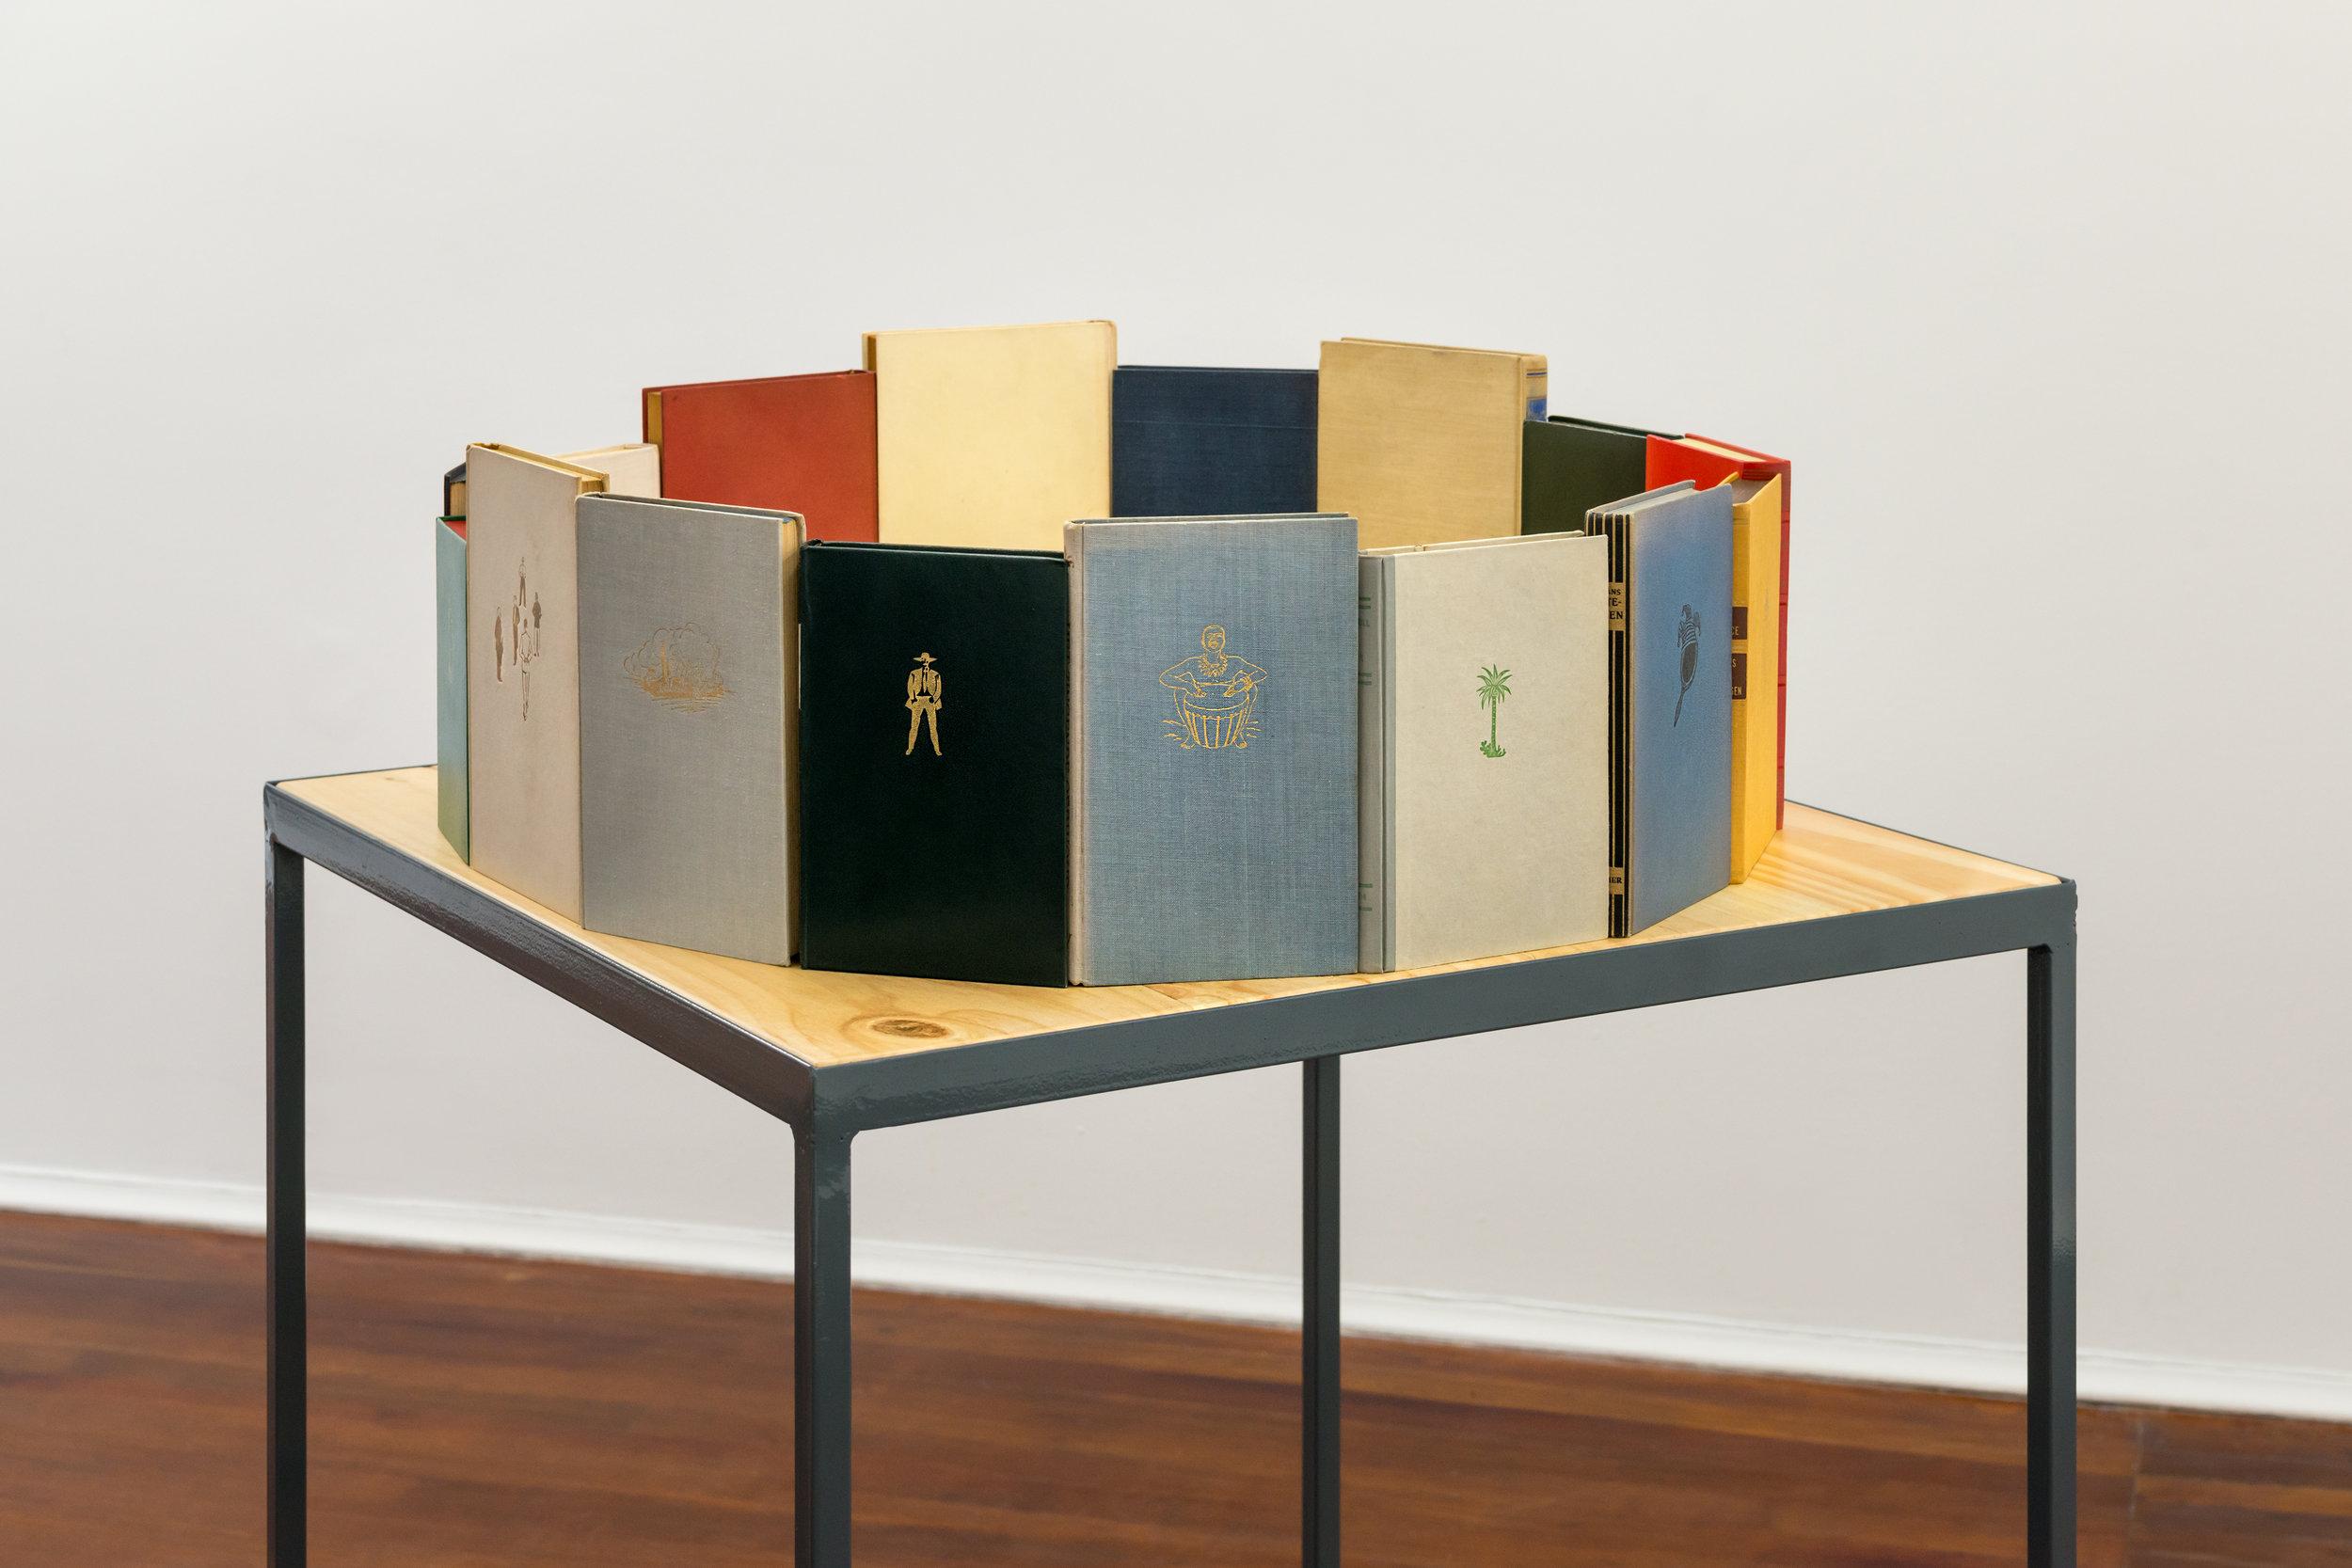 Copy of Narrativas cíclicas, Assemblage with books + metallic table, 2017